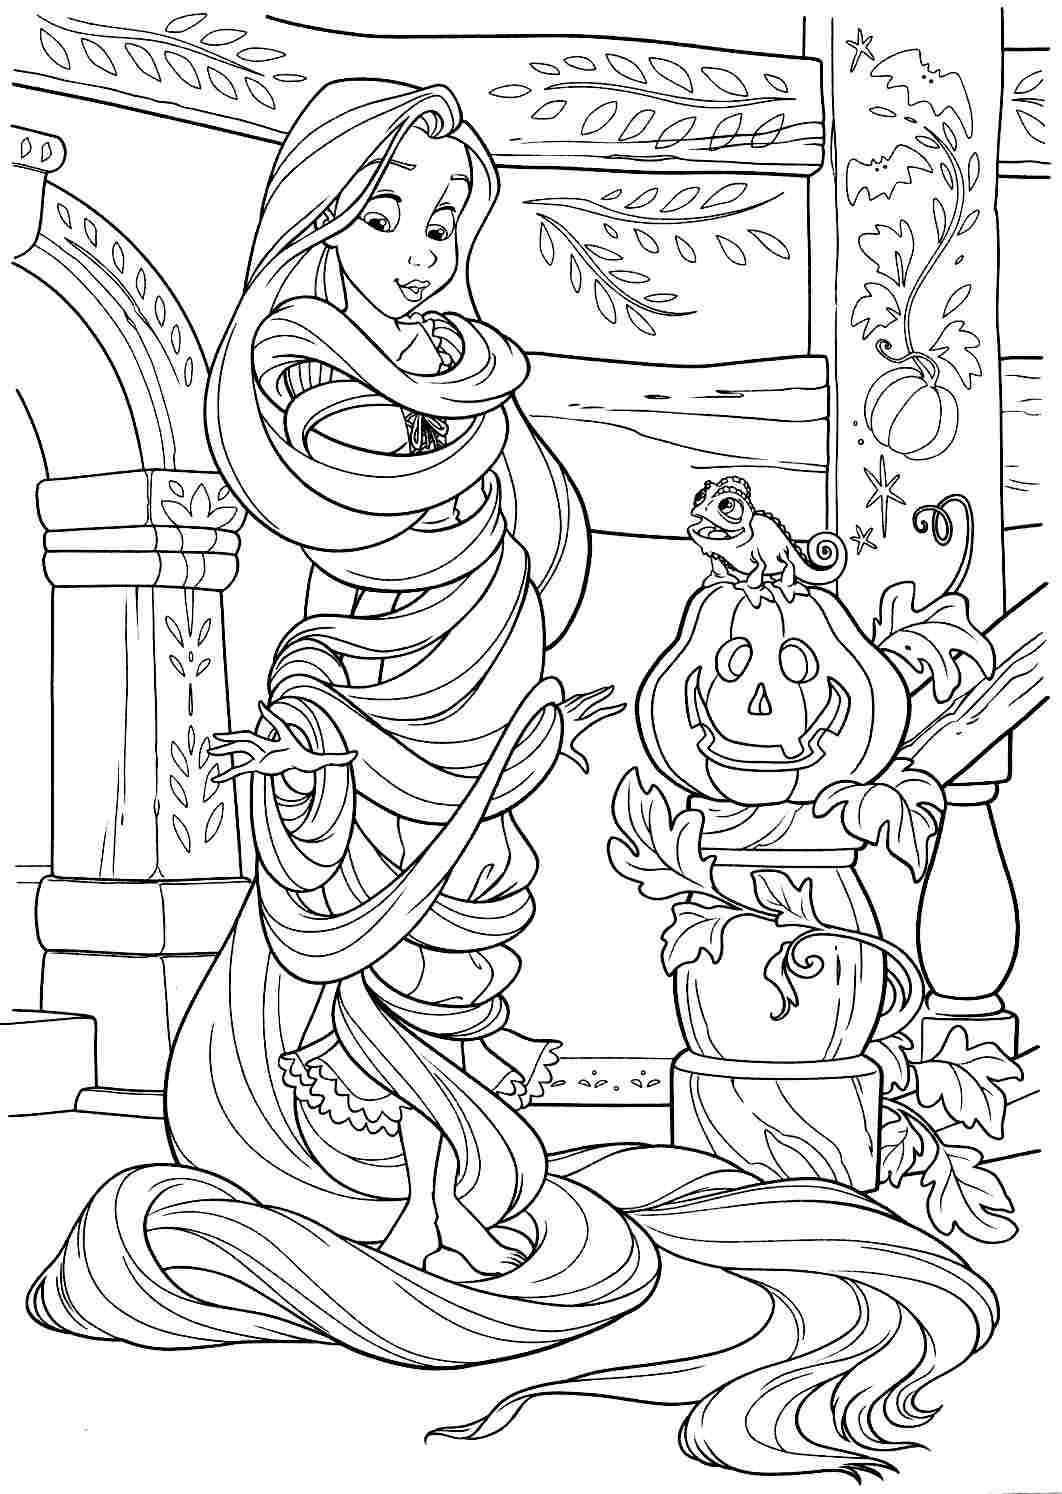 Colouring Pages Disney Princess Tangled Rapunzel Printable